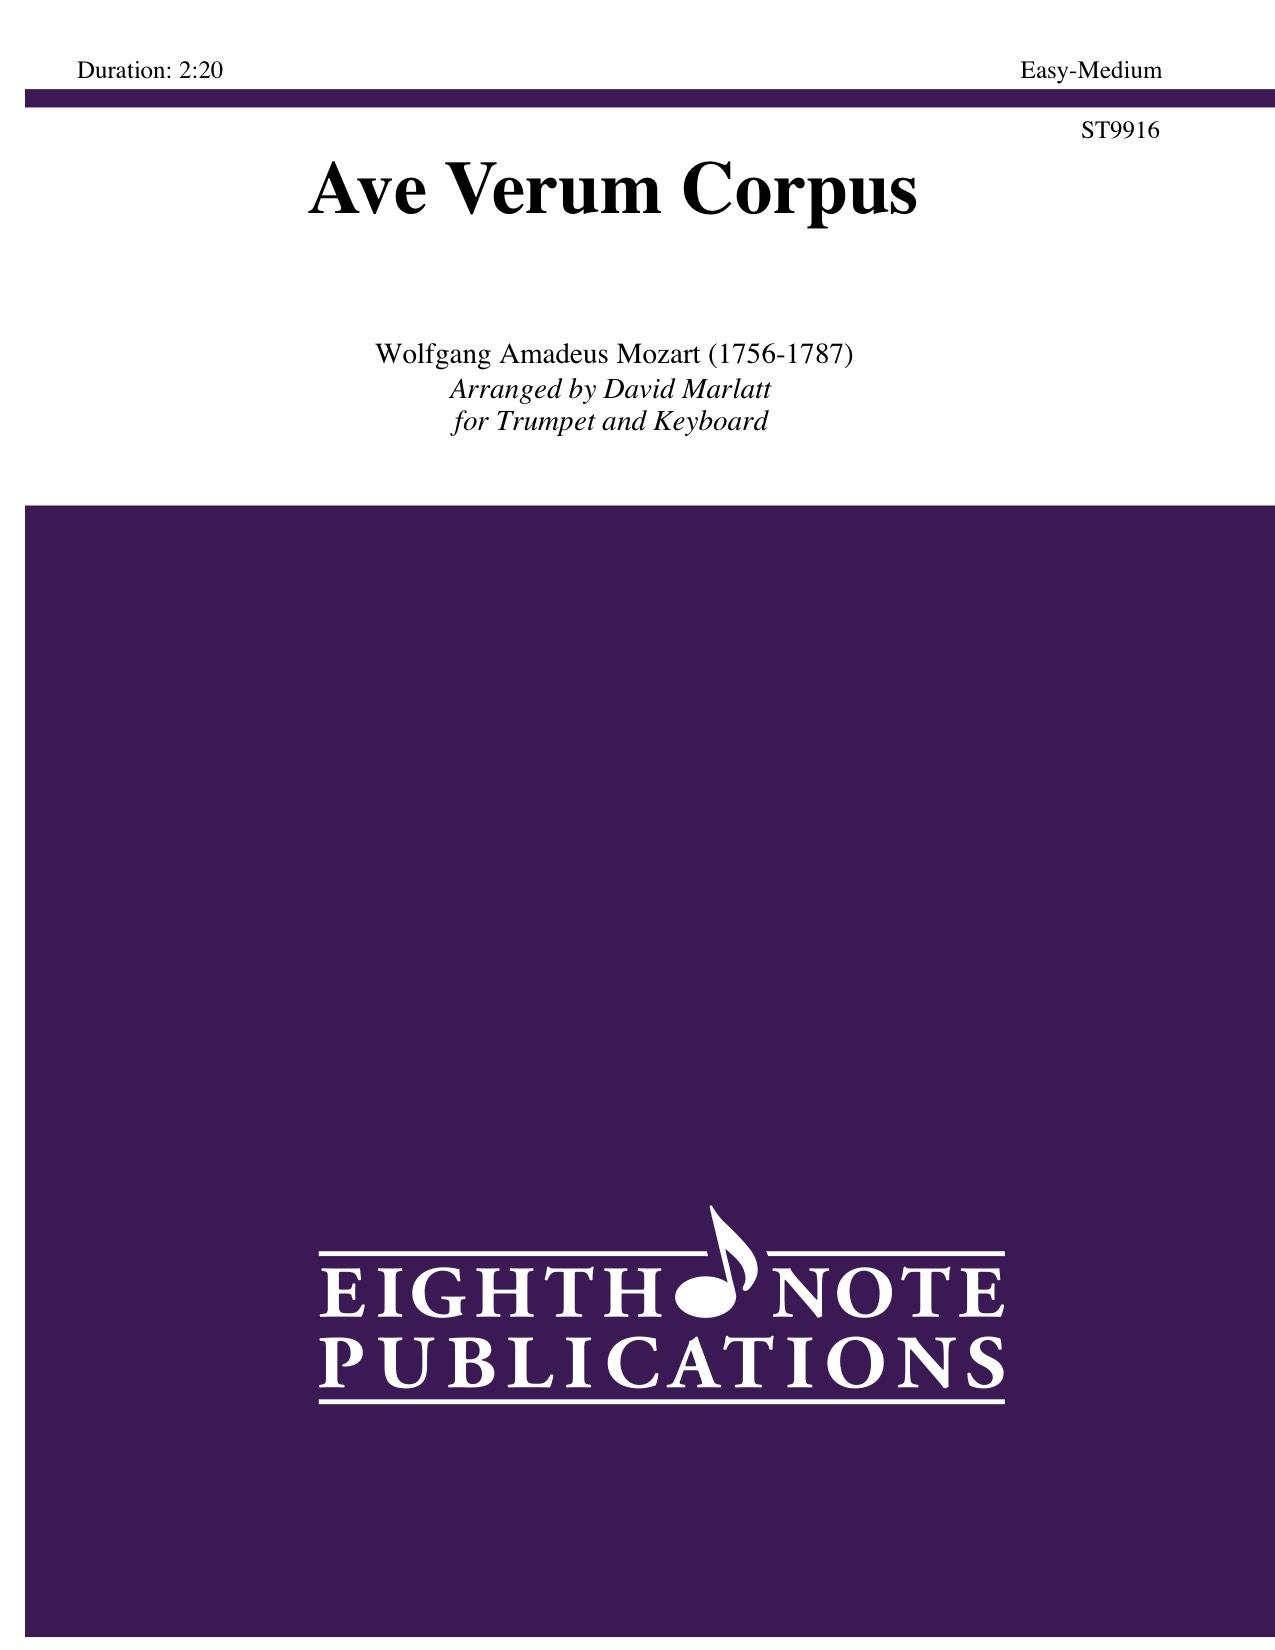 Ave Verum Corpus   - Wolfgang Amadeus Mozart